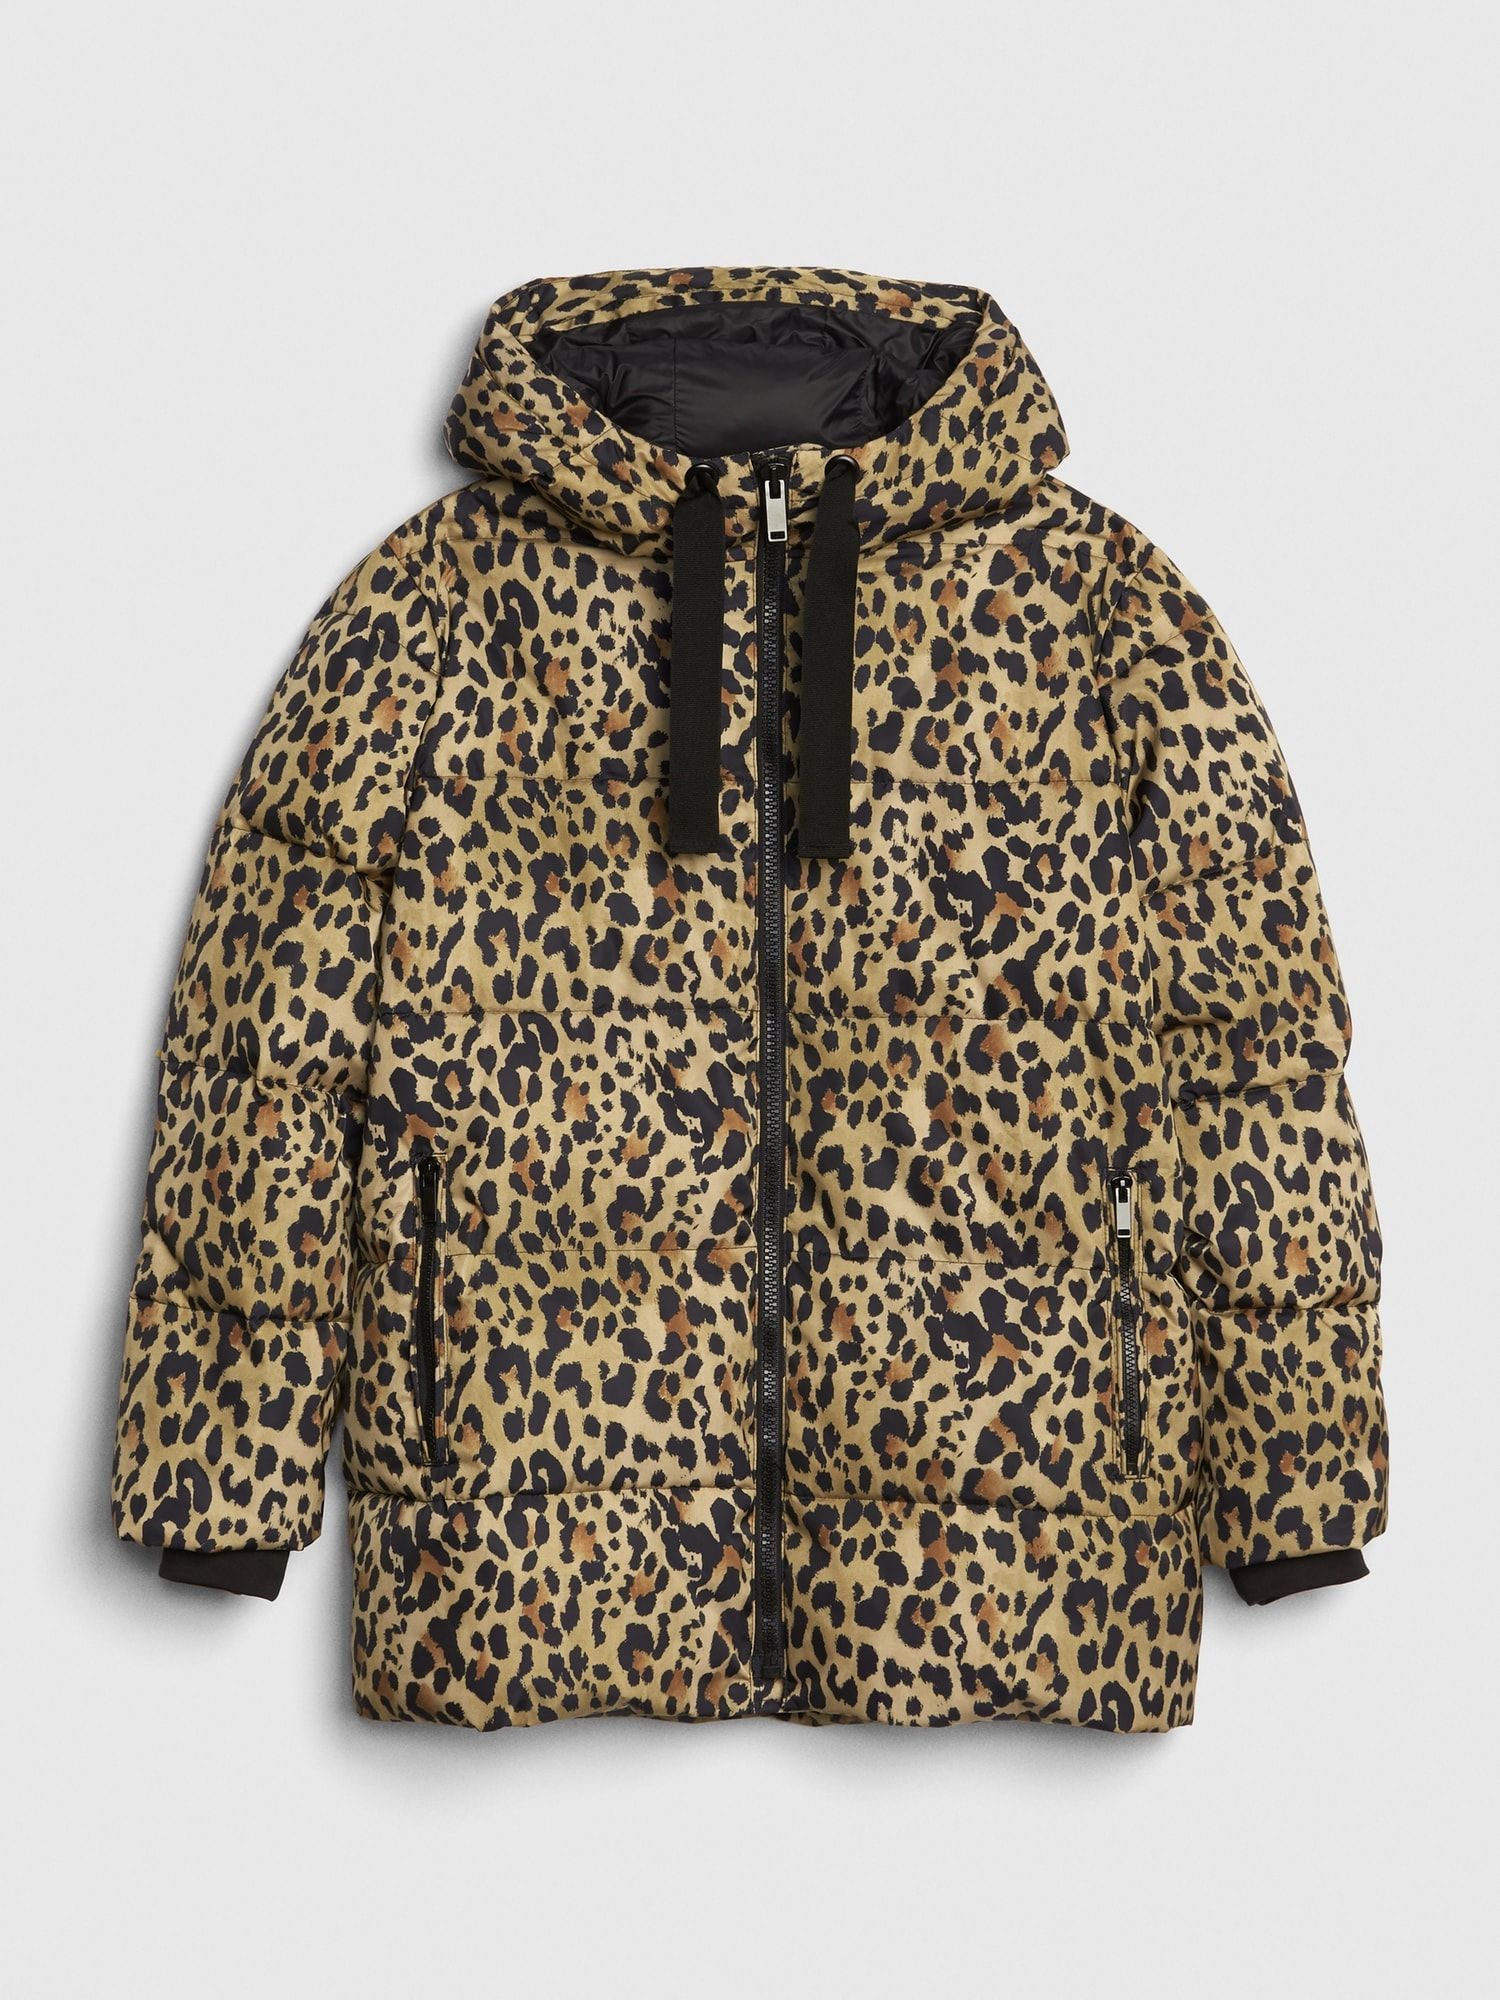 Coldcontrol Max Hooded Print Puffer Jacket Gap Autumn Fashion Casual Padded Jacket Fashion [ 2000 x 1500 Pixel ]